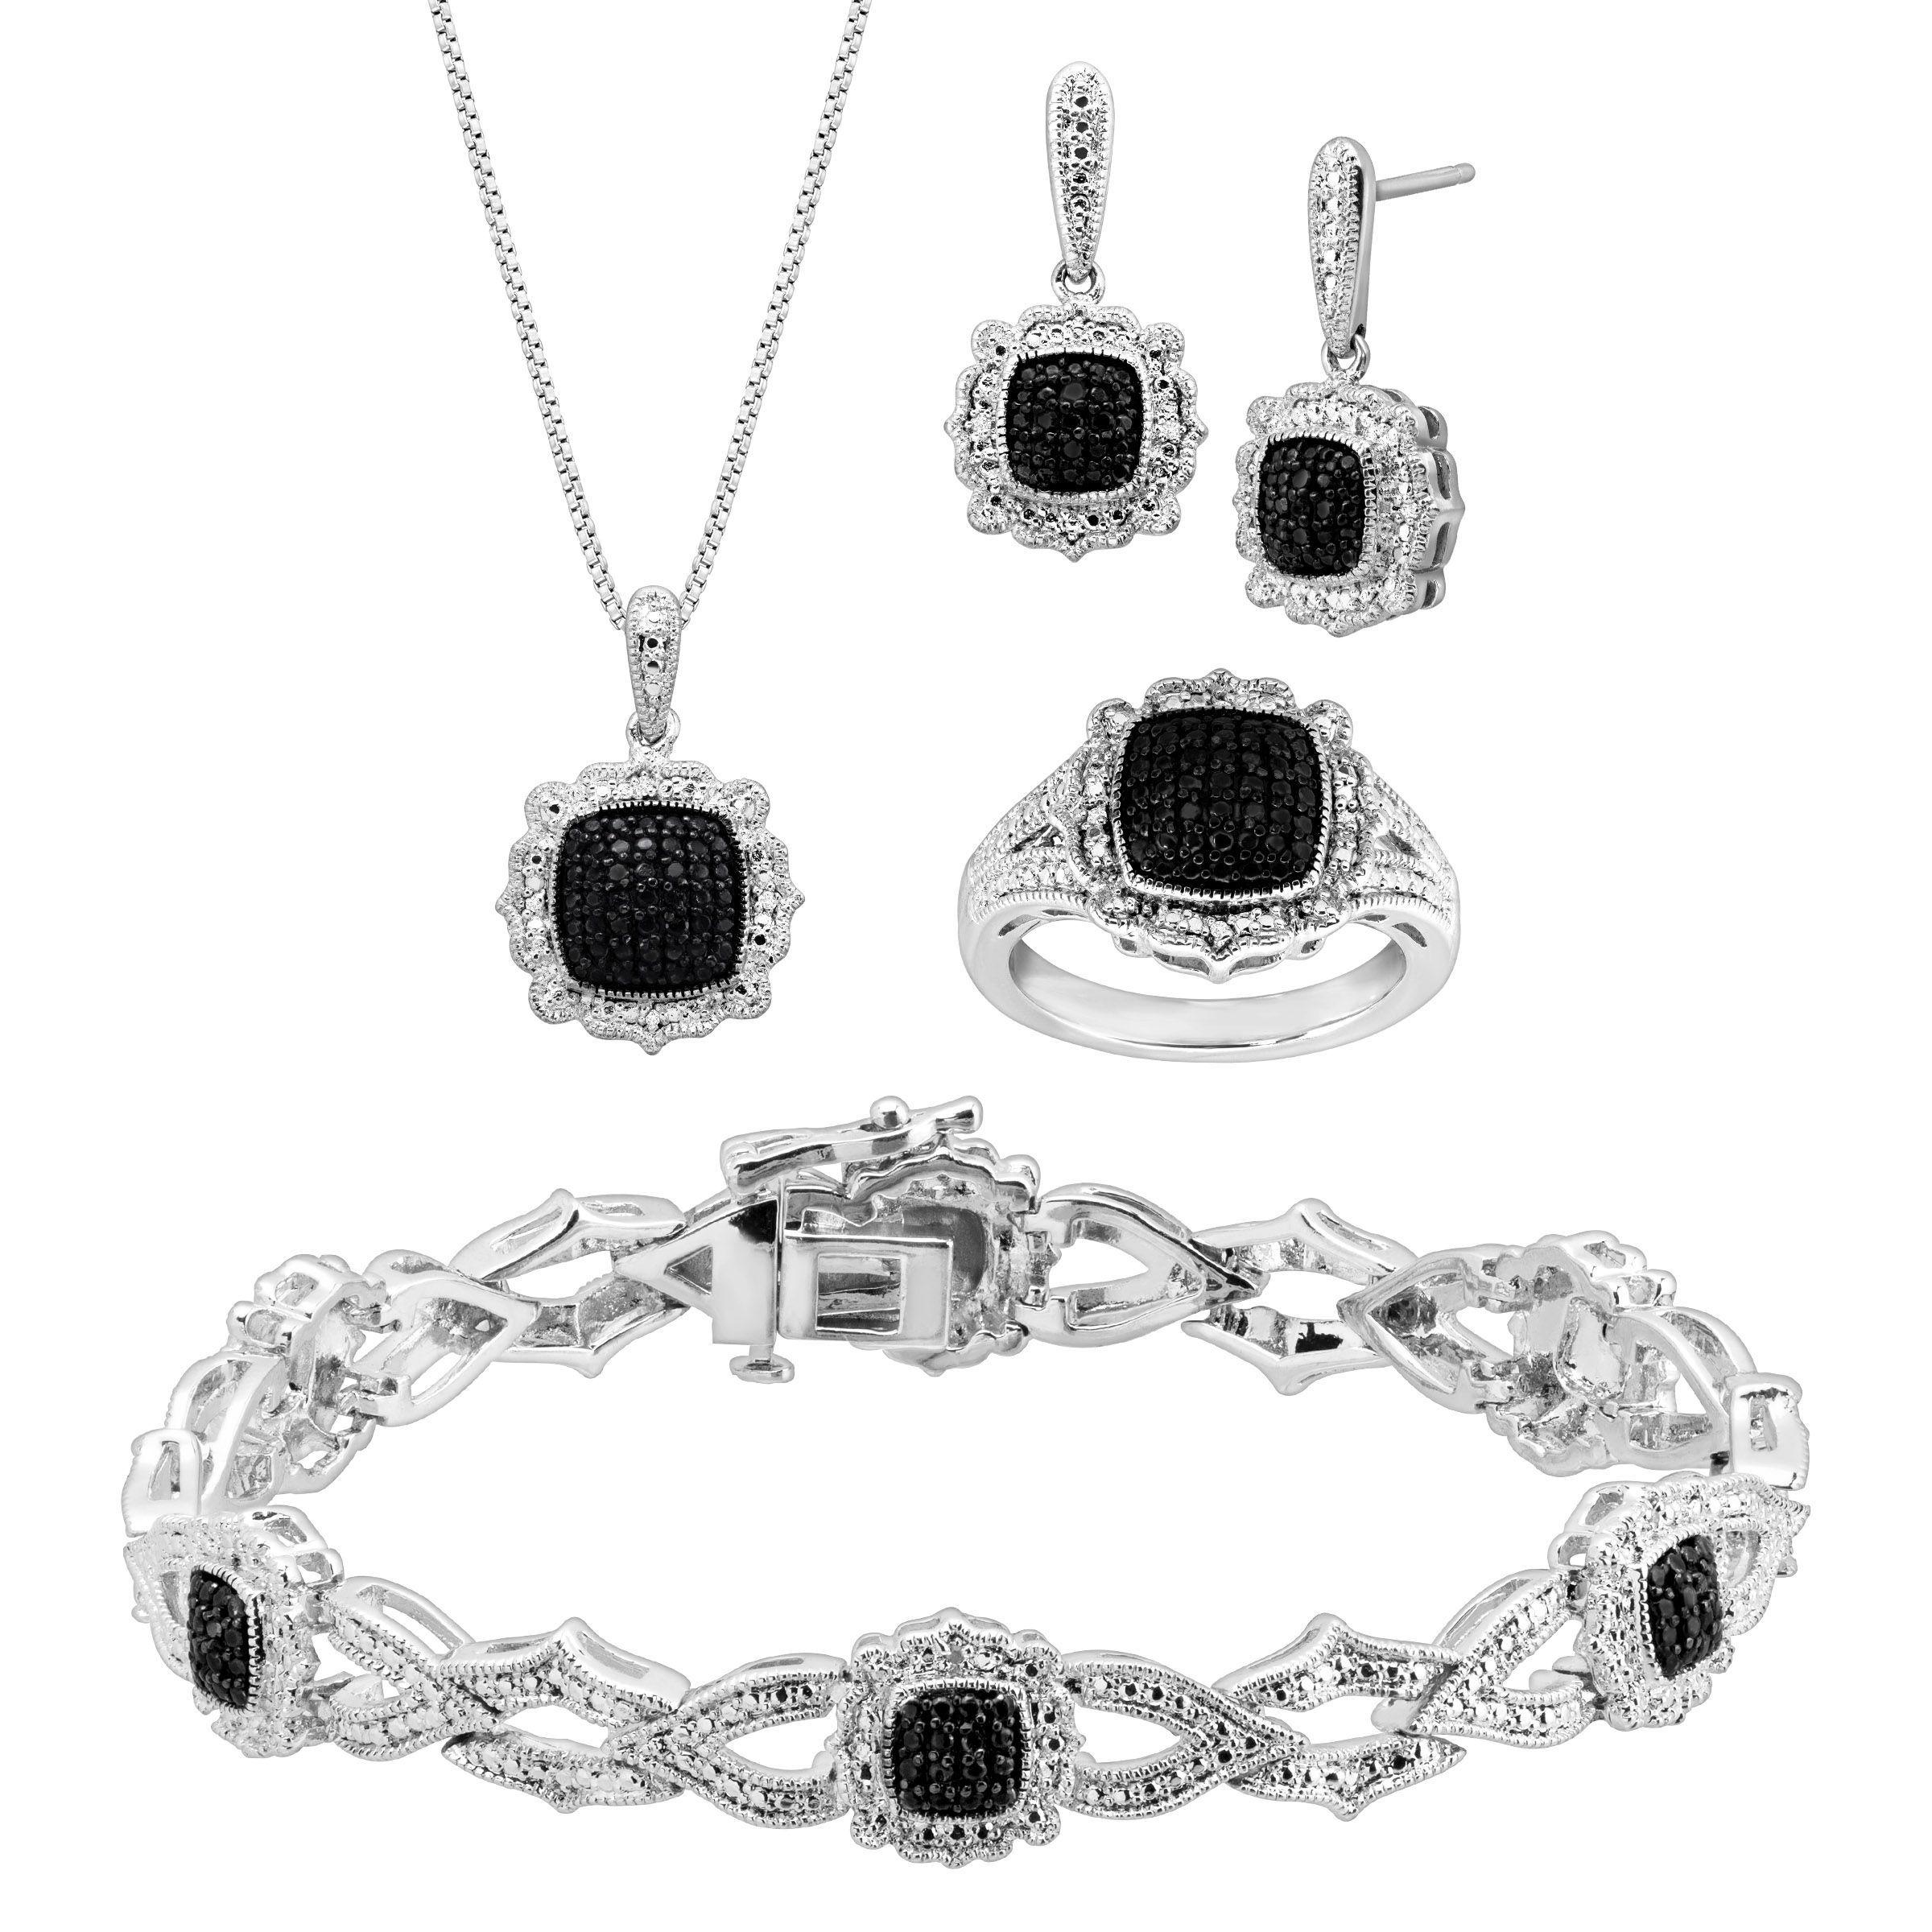 1 5 ct black white diamond jewelry set in rhodium plated. Black Bedroom Furniture Sets. Home Design Ideas